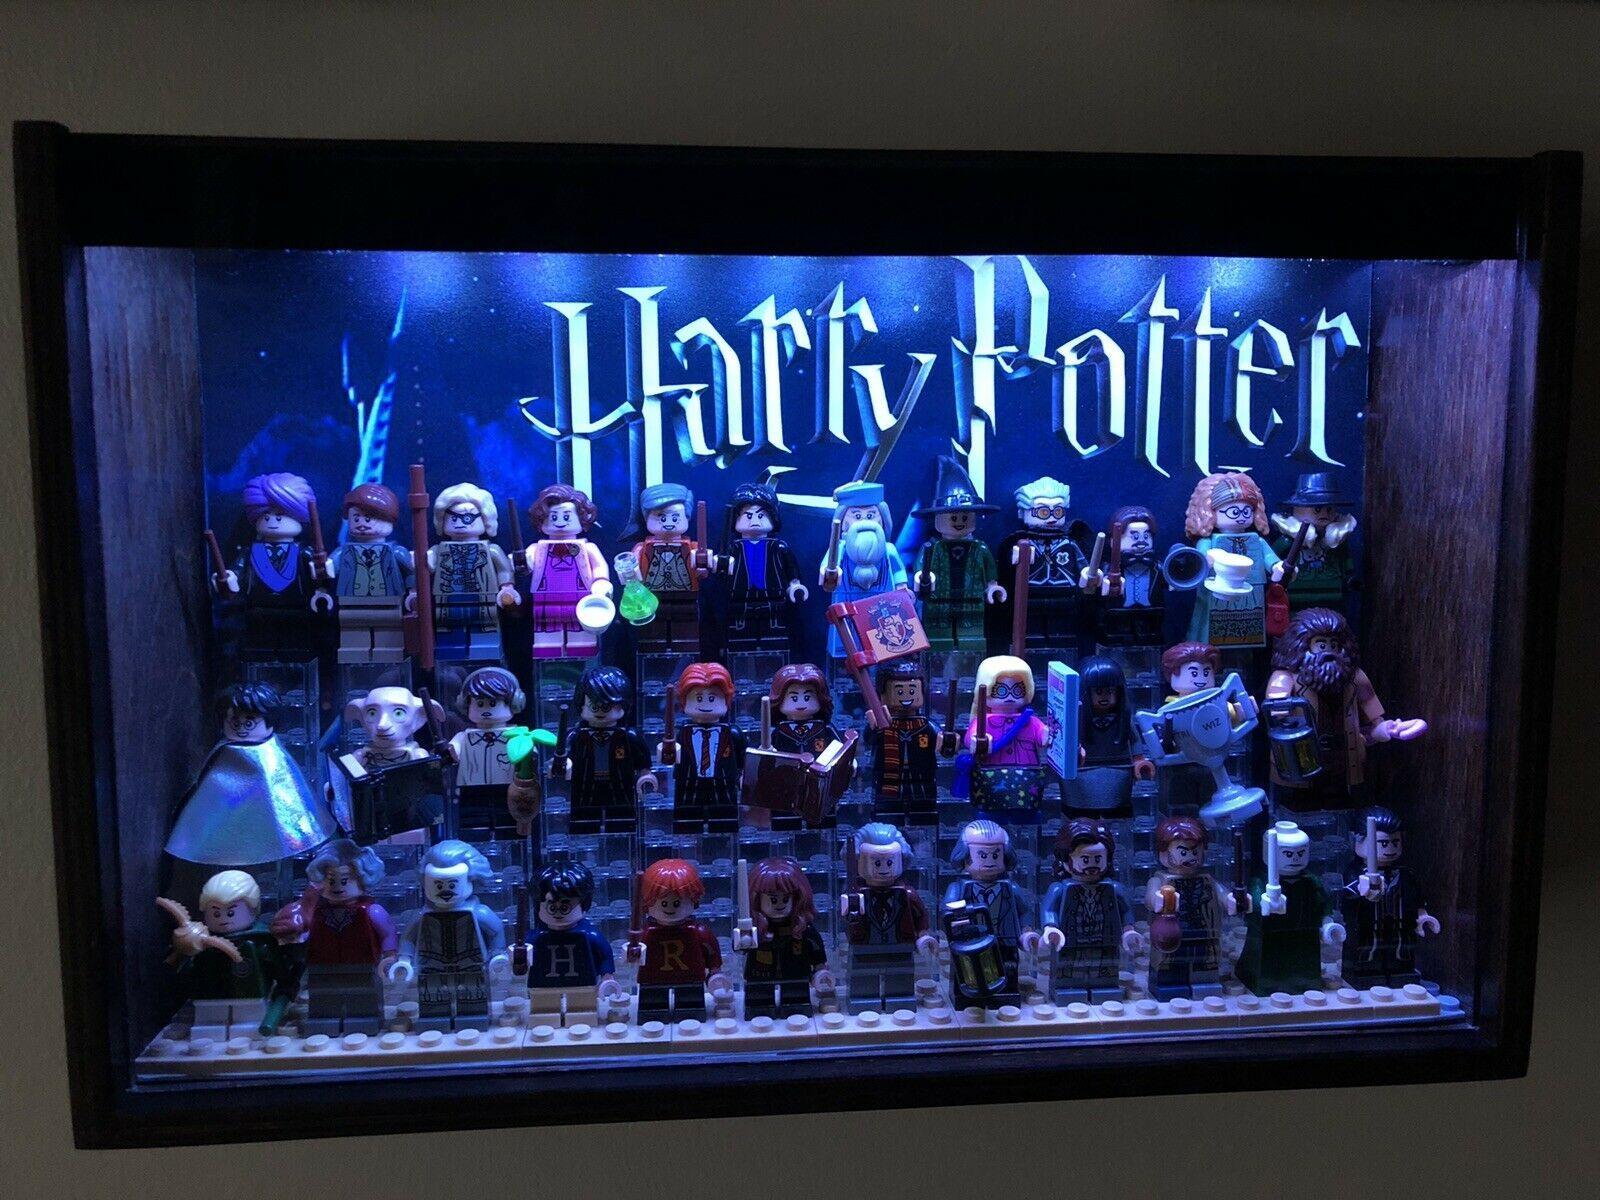 Lego Harry Potter Cmf Minifigures Bricktober With Custom Light Up Display Case Ebay Lego Display Display Case Lego Harry Potter